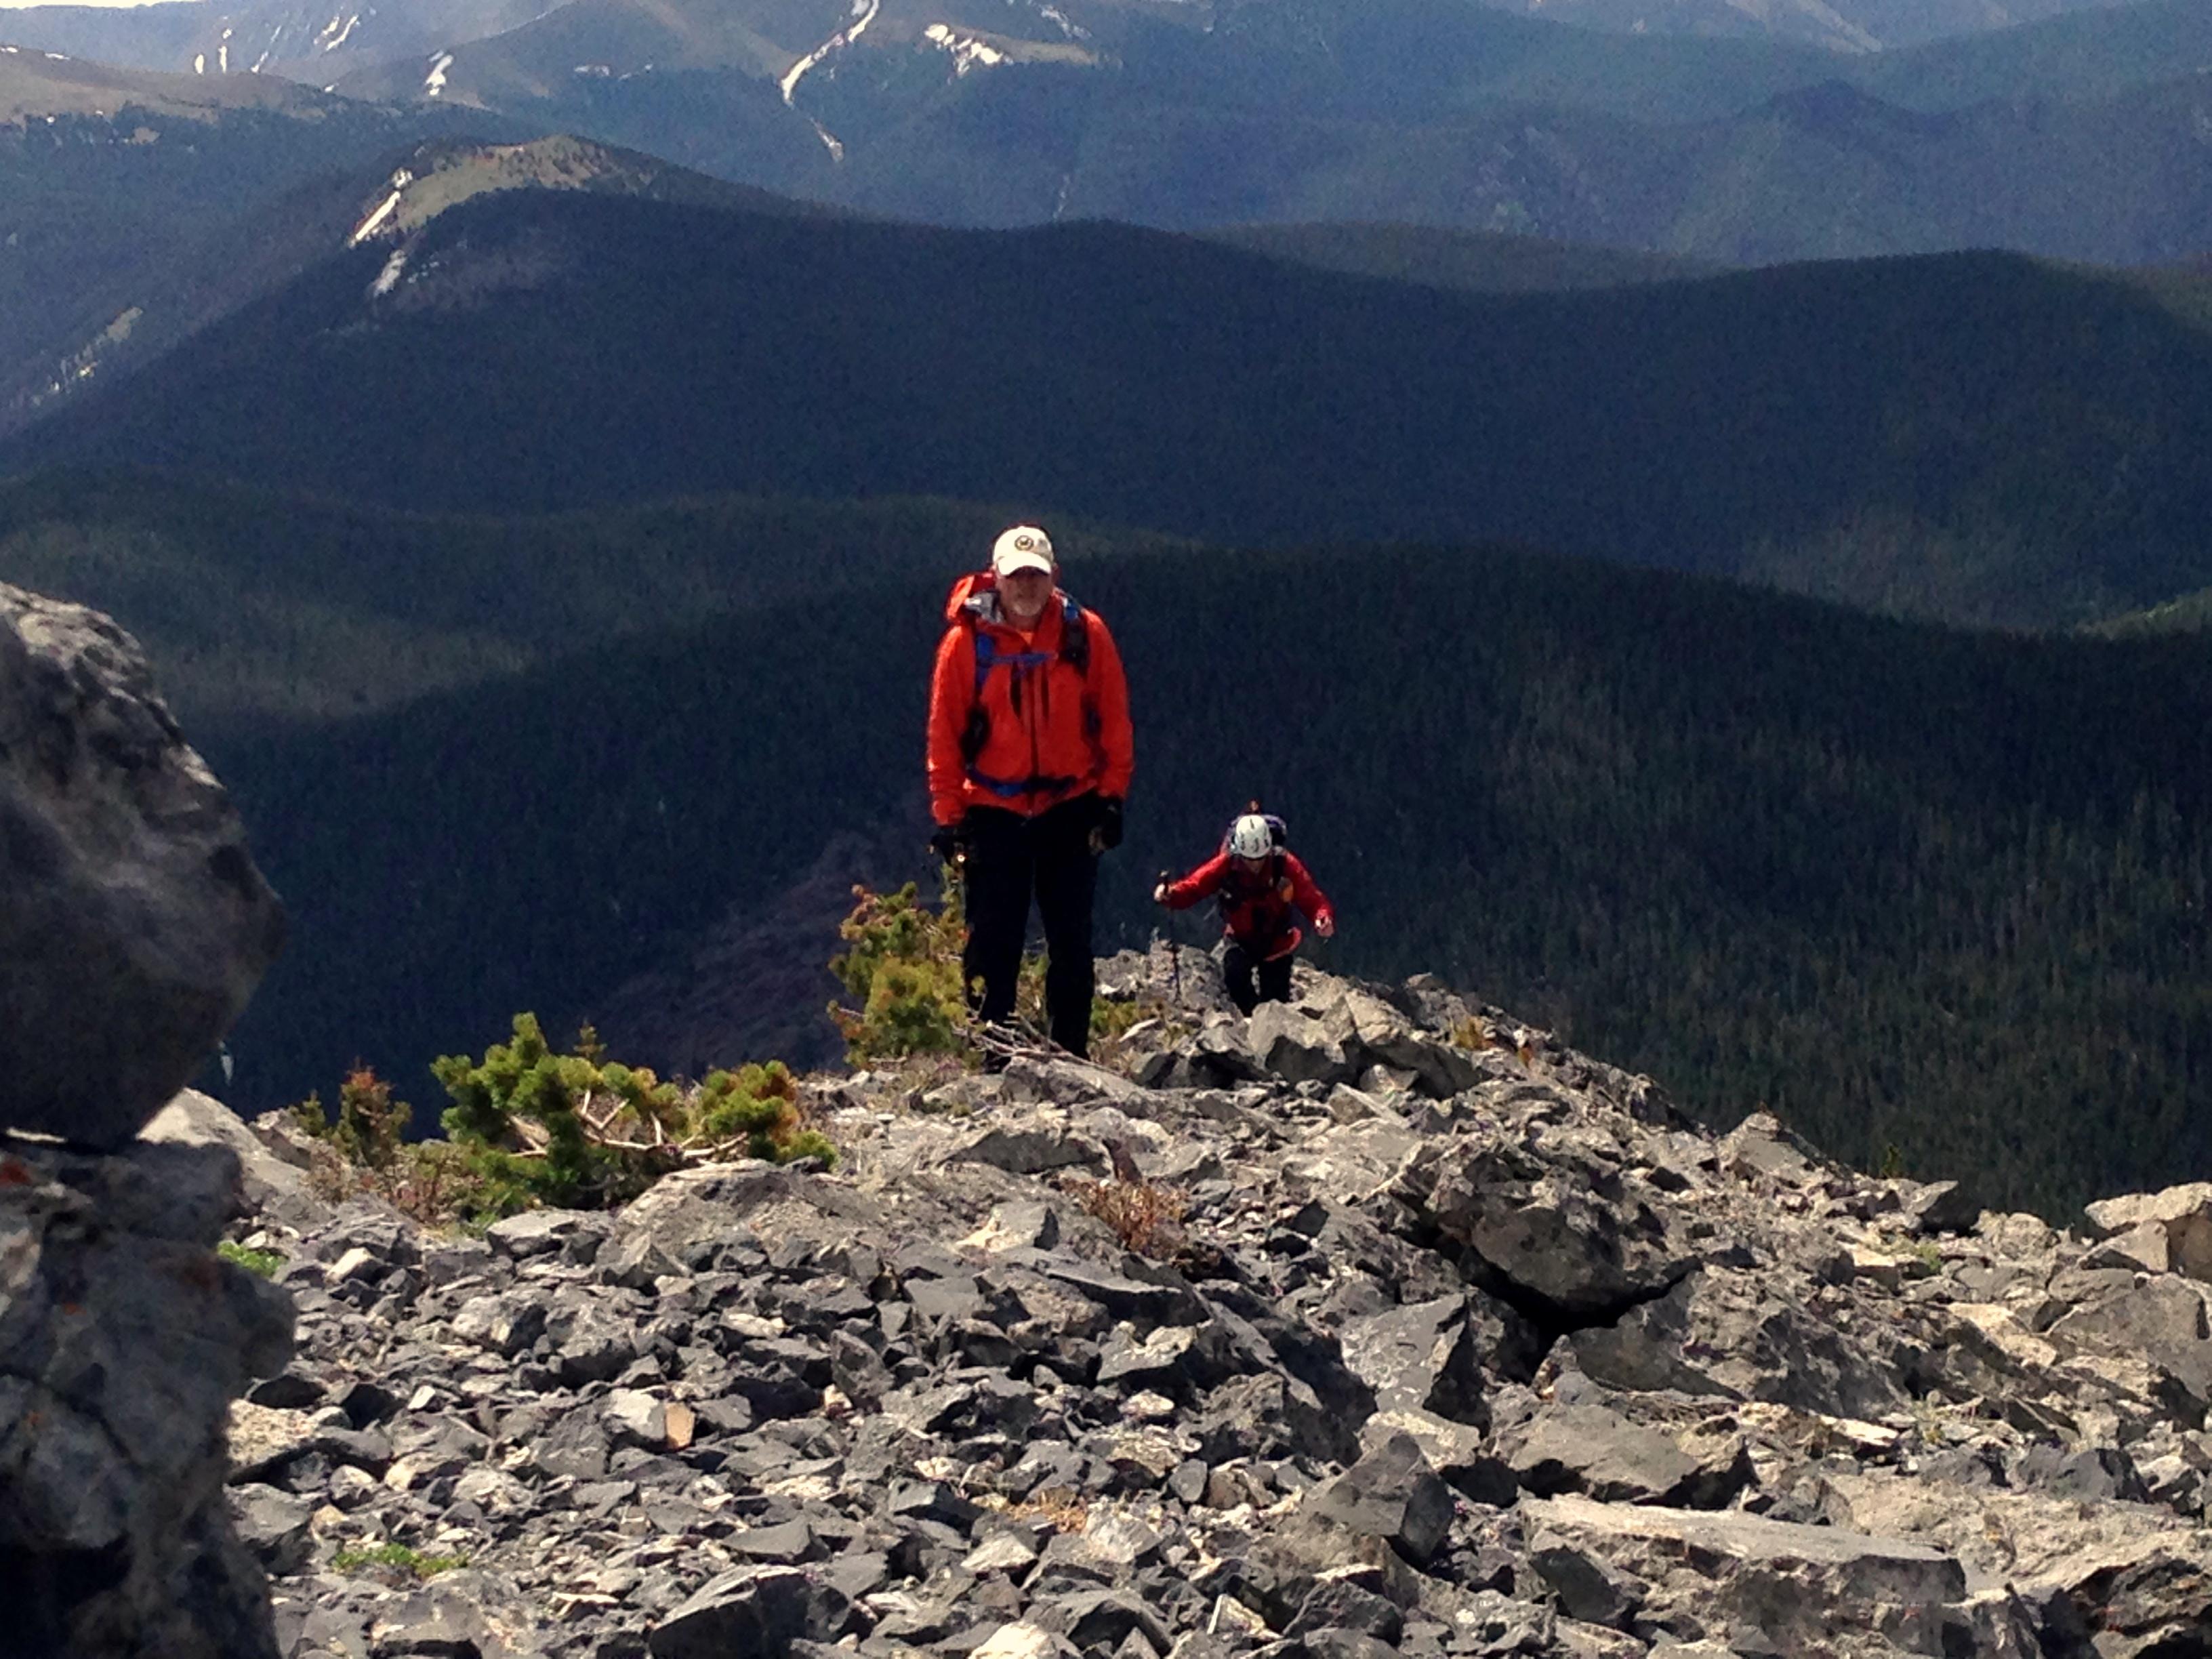 The slog up Galena Peak